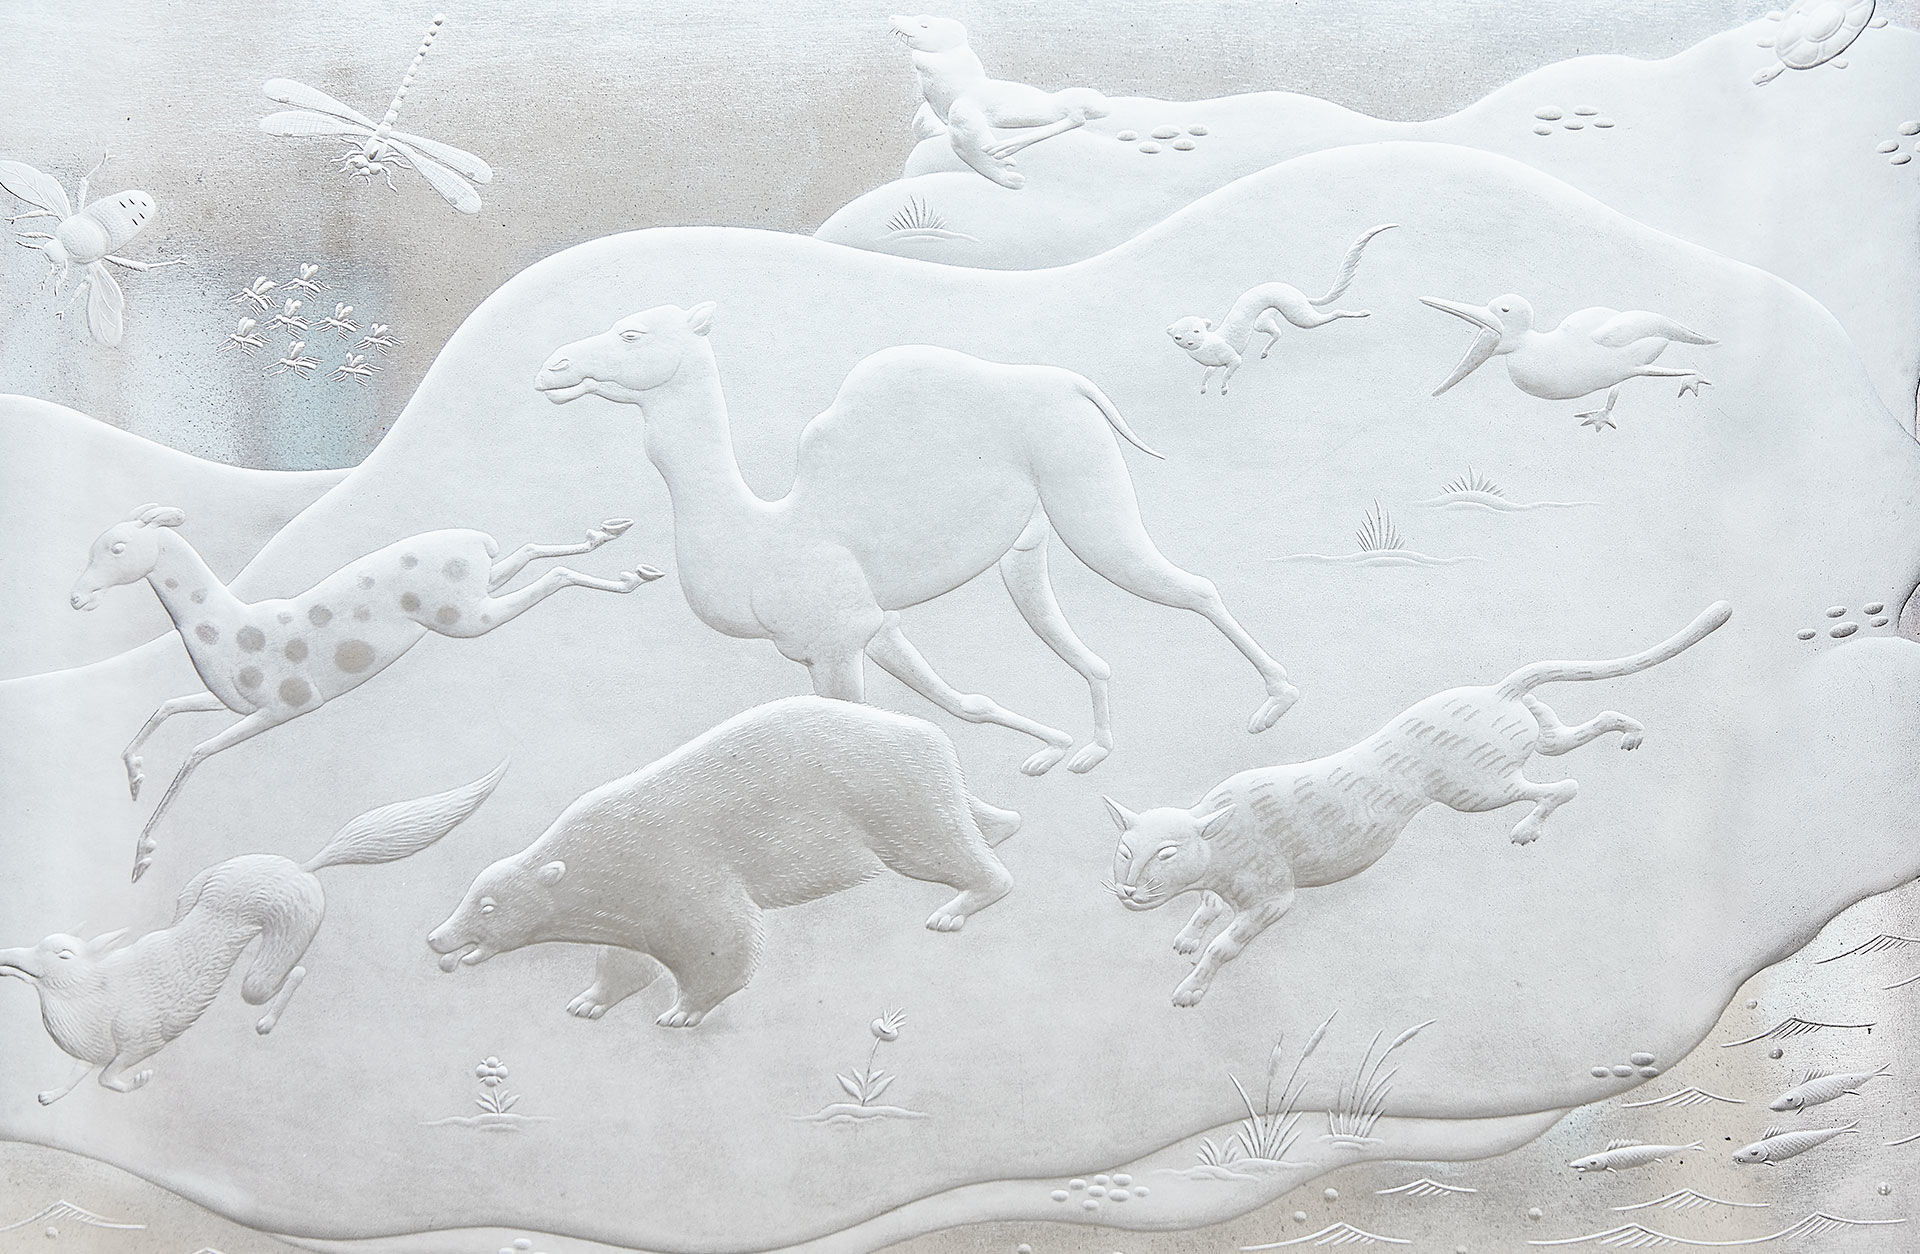 Konst-i-konserthuset-glasrelief-bild-i-text